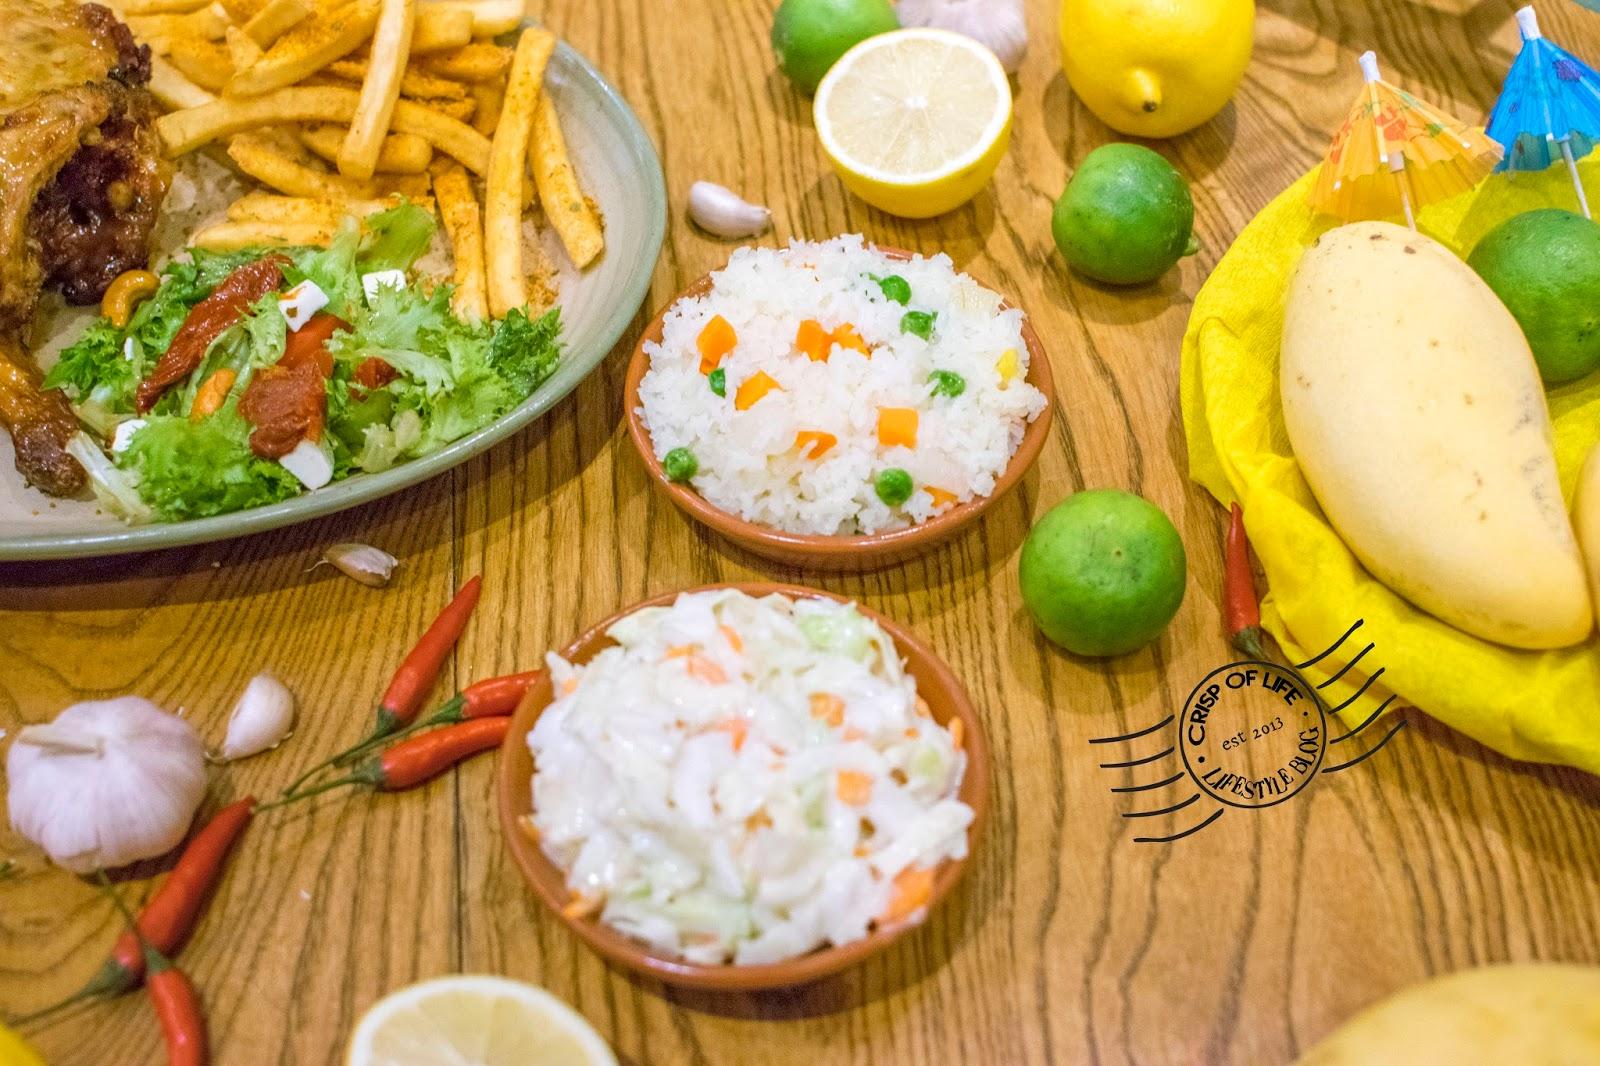 Nando's Malaysia Launched New PERi-PERi Flavour - Mango & Lime